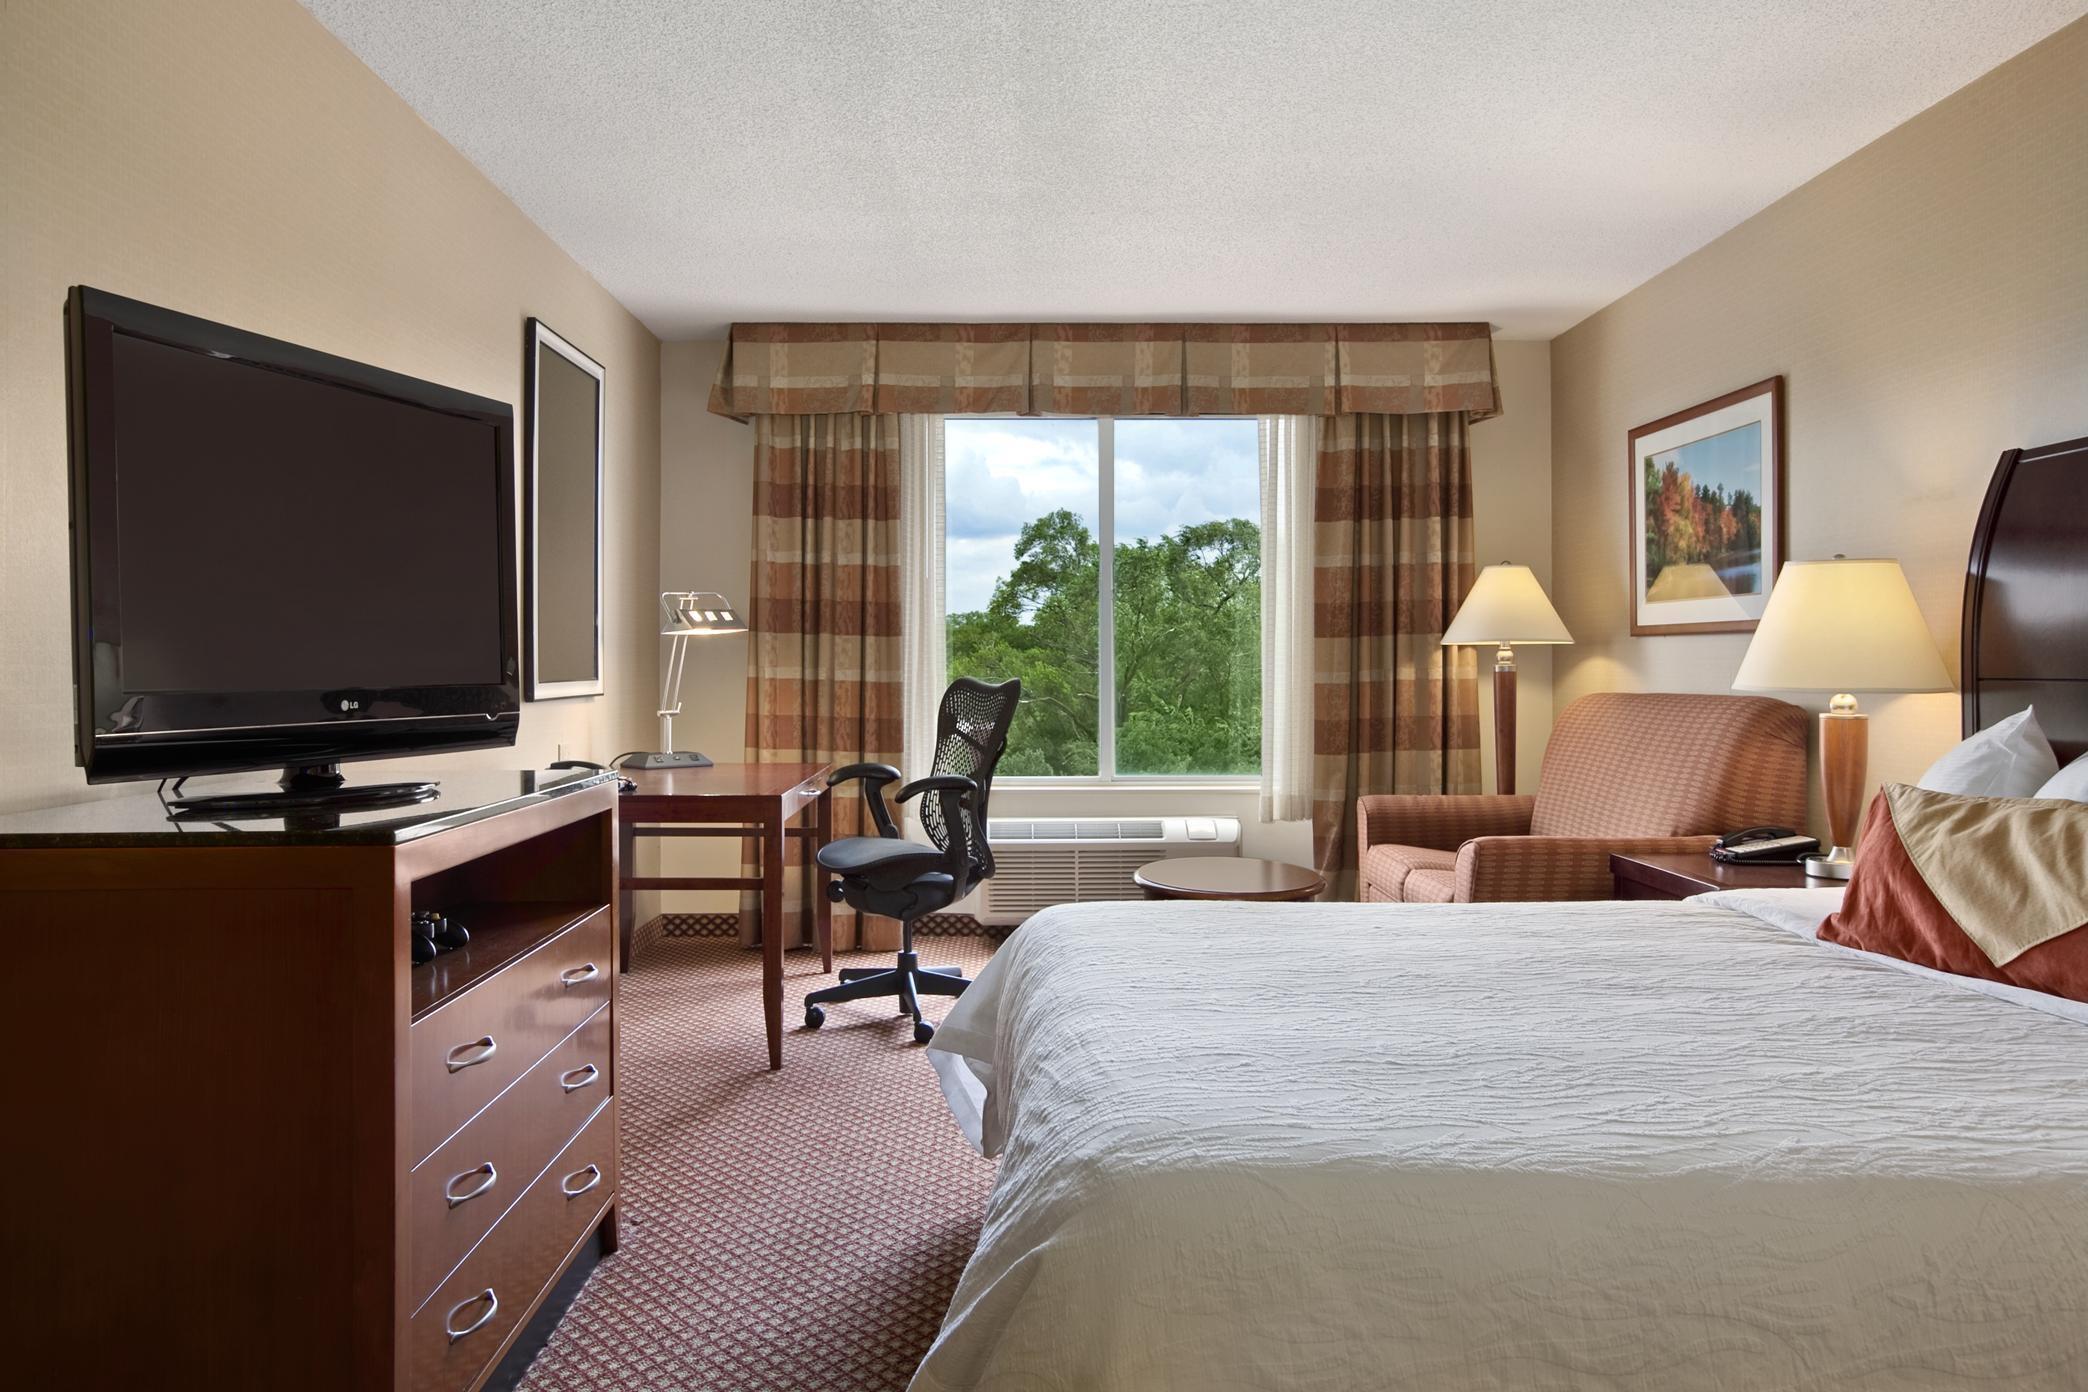 Hilton Garden Inn Chicago/Oakbrook Terrace image 7